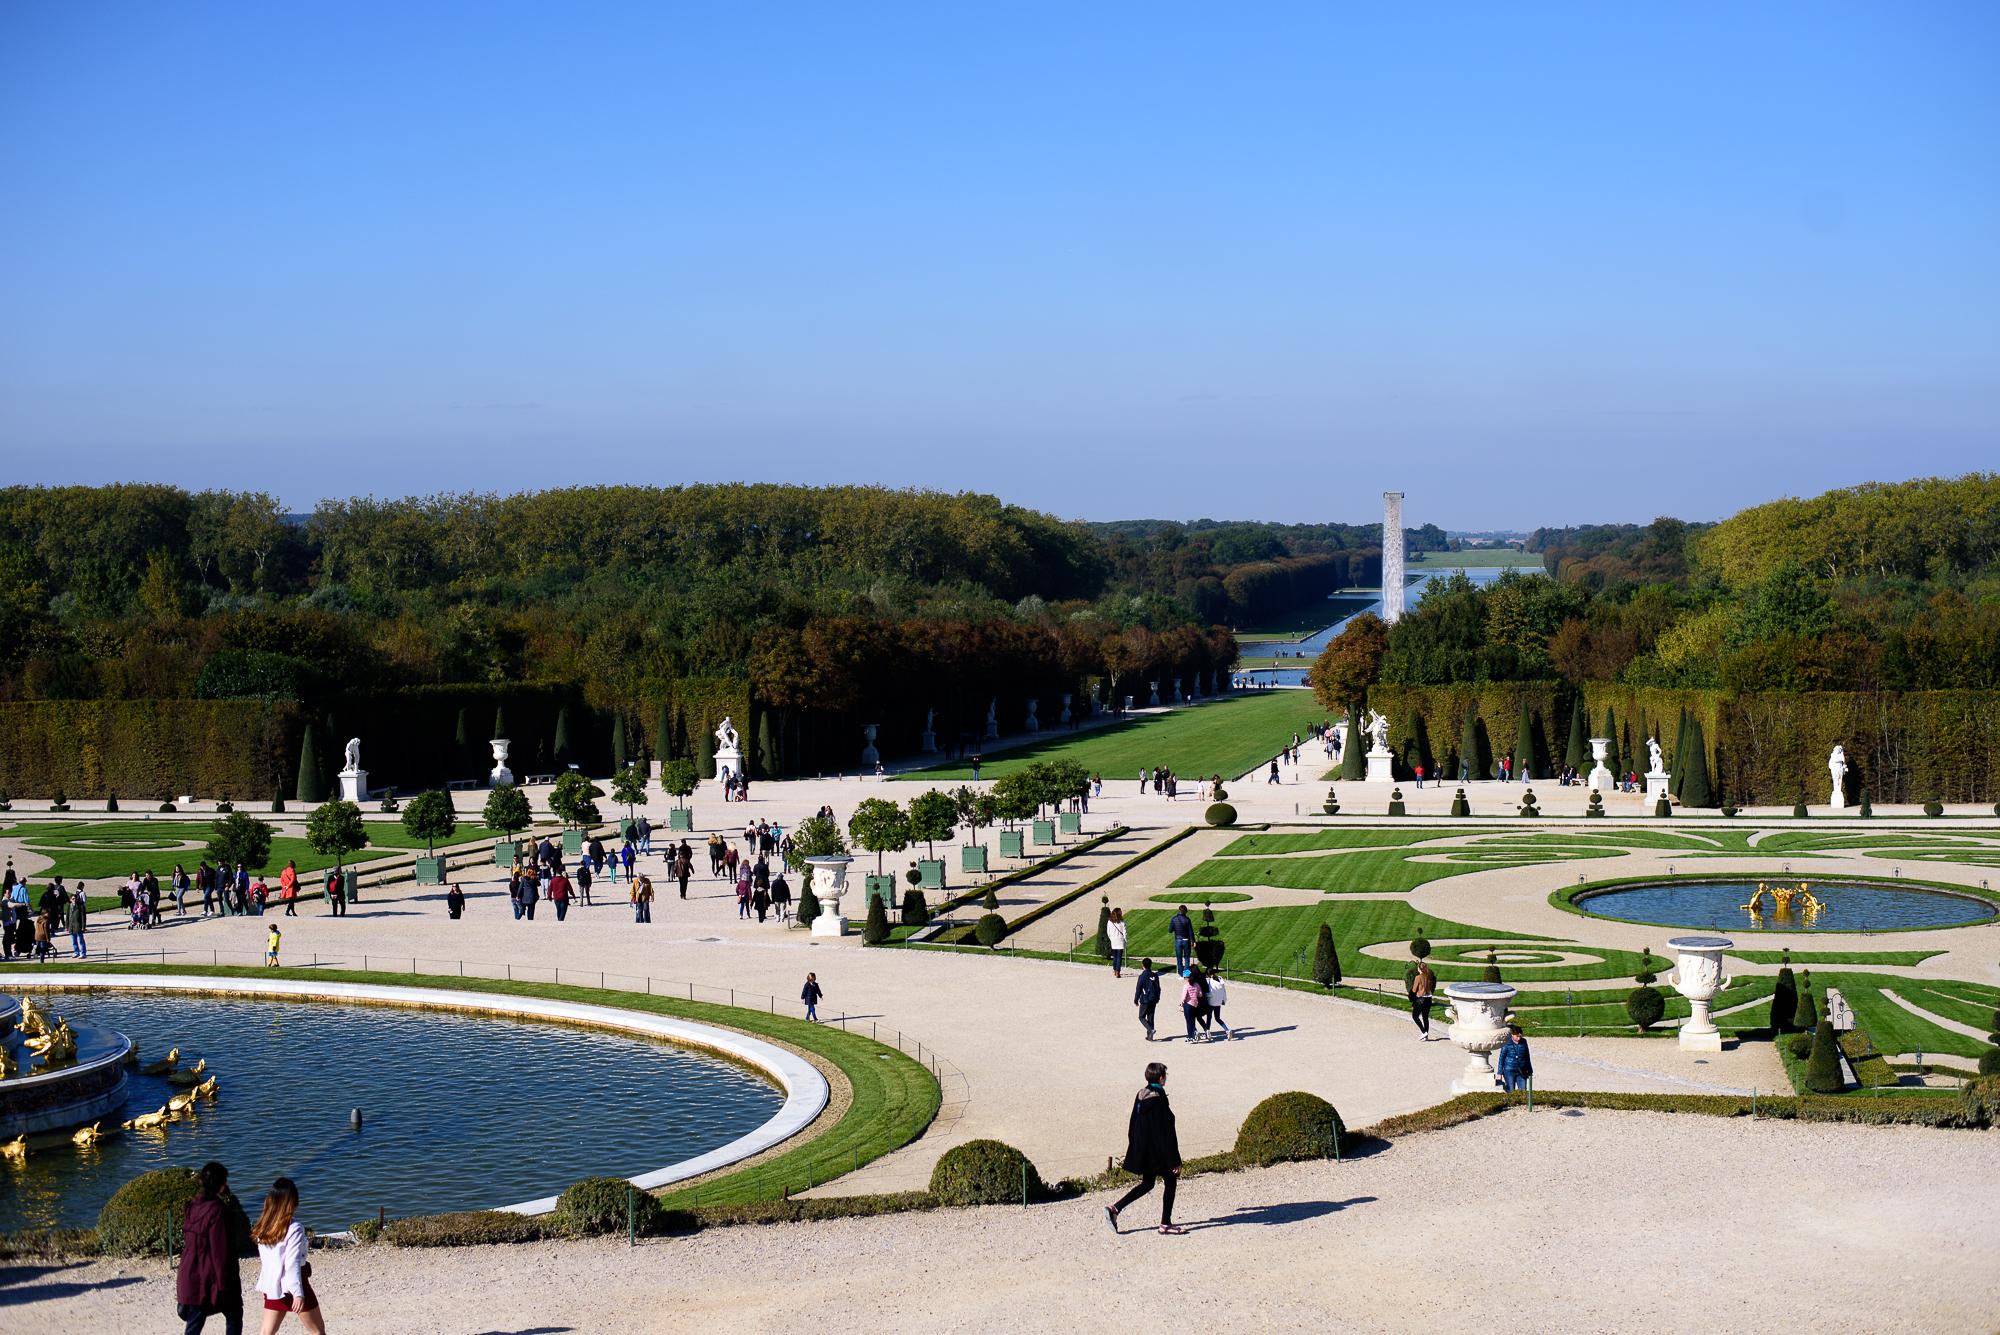 palace-of-versailles-garden-3